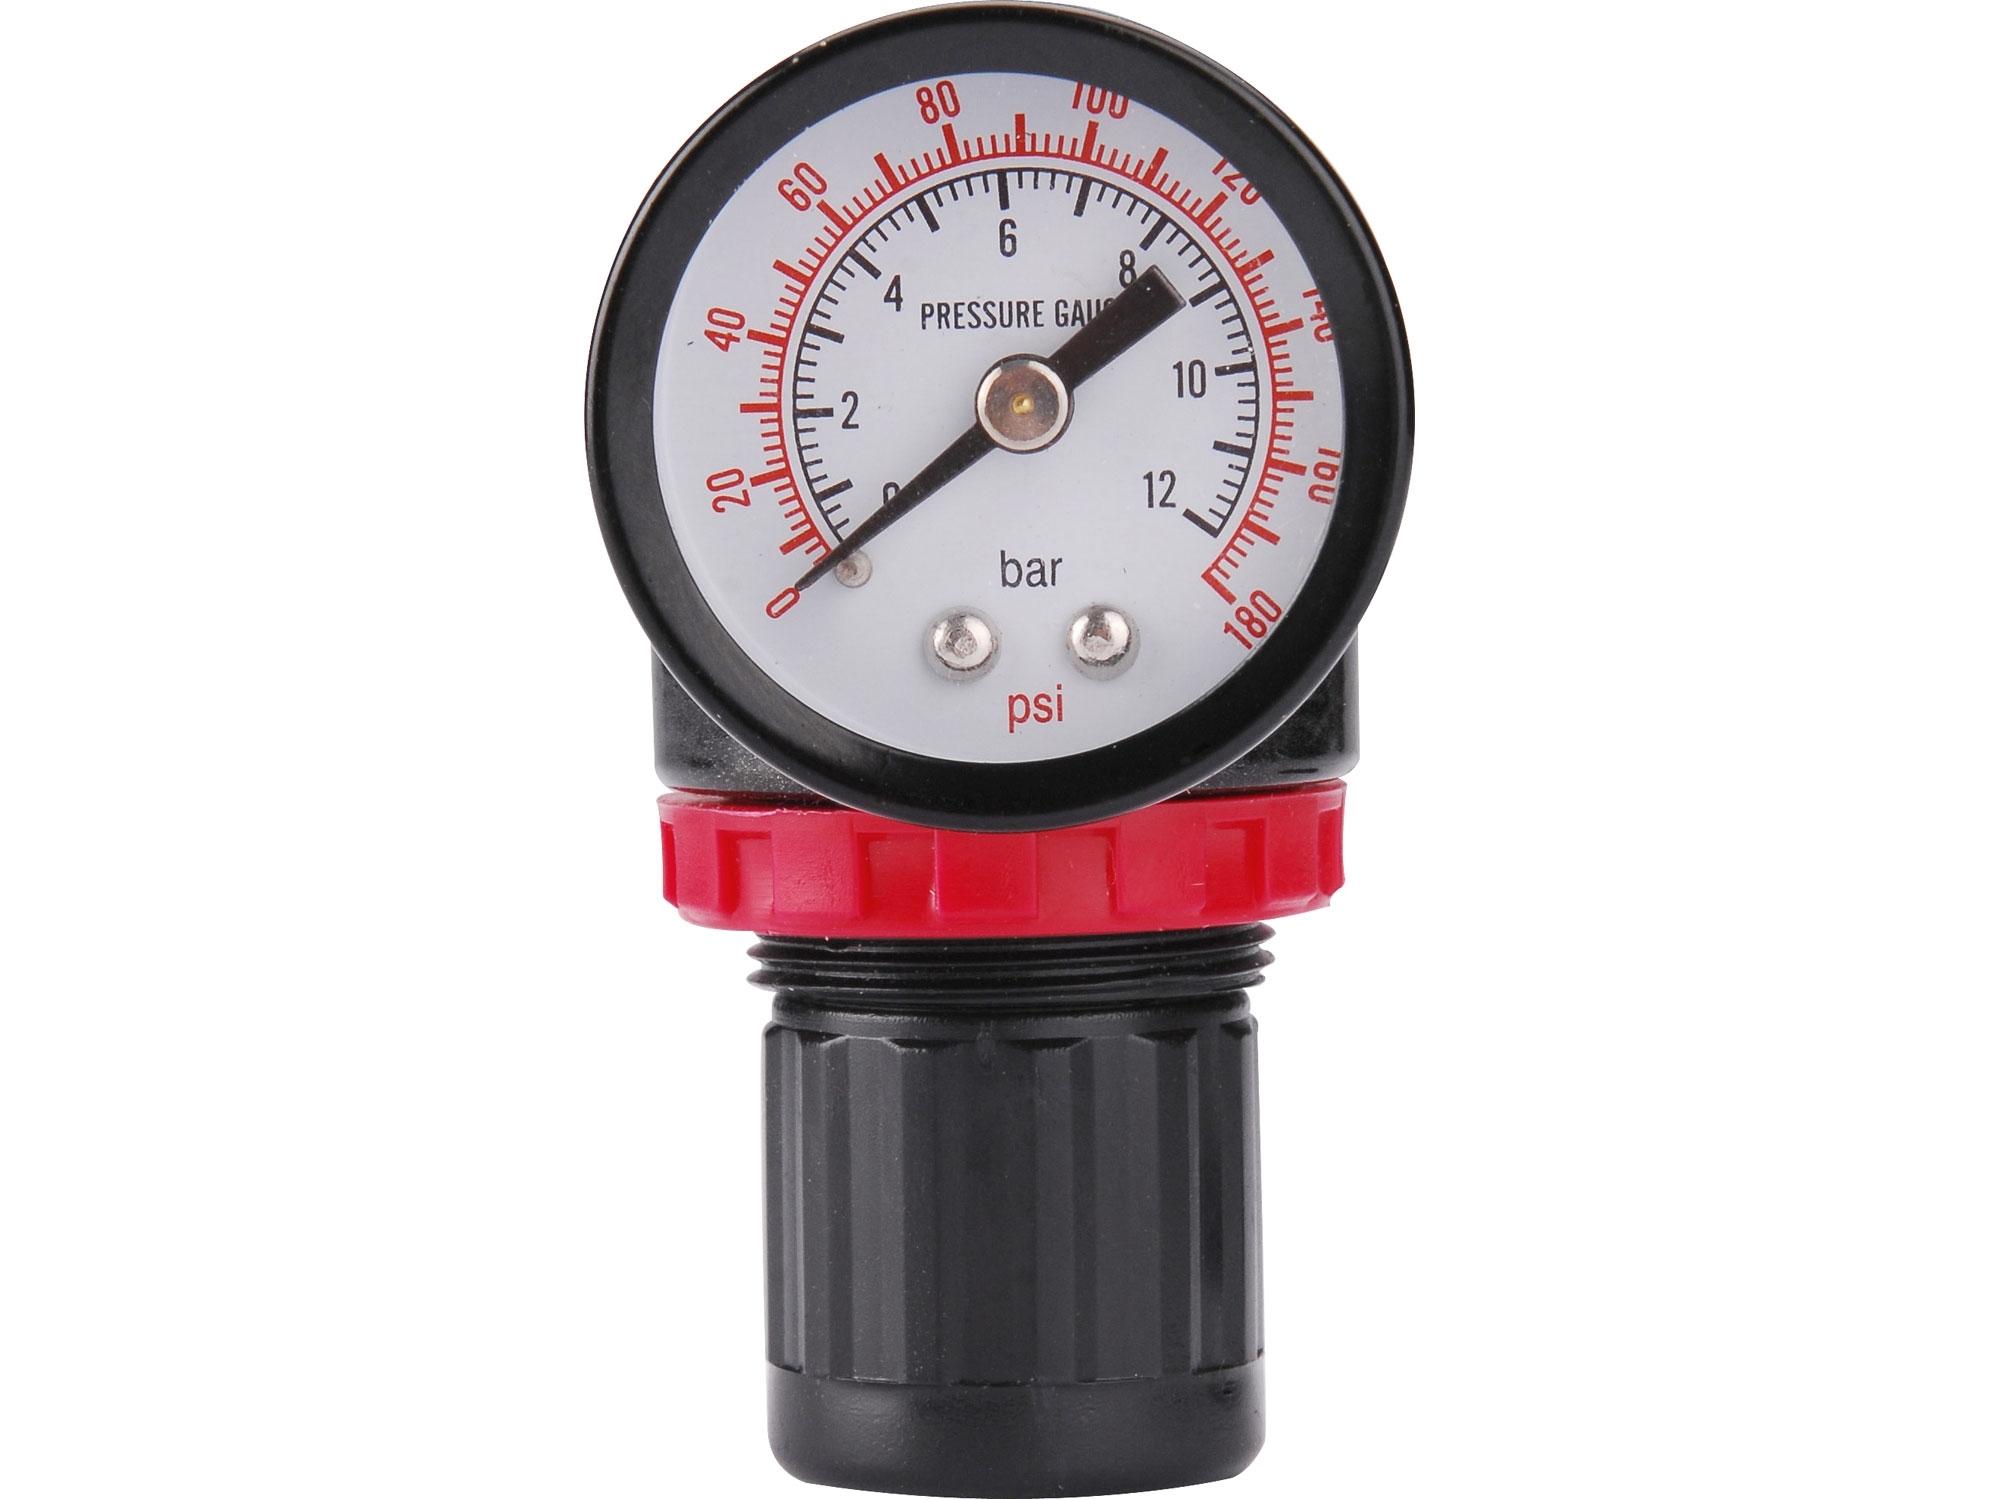 regulátor tlaku s manometrem, EXTOL PREMIUM, 8865103 8865103